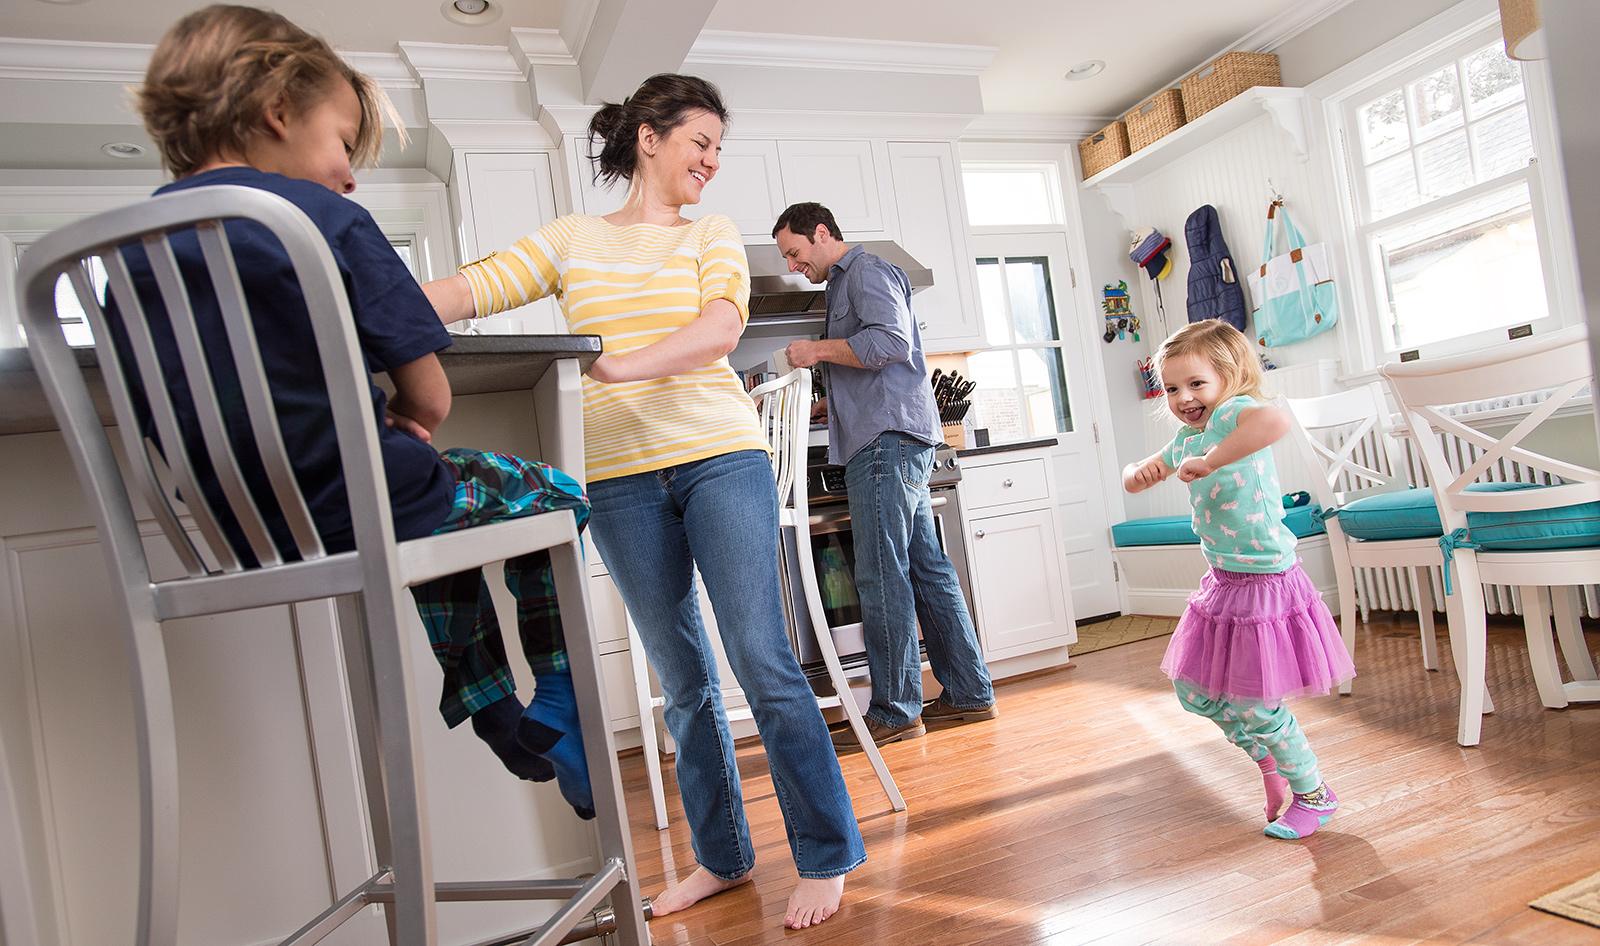 kitchen_dancing copy.jpg